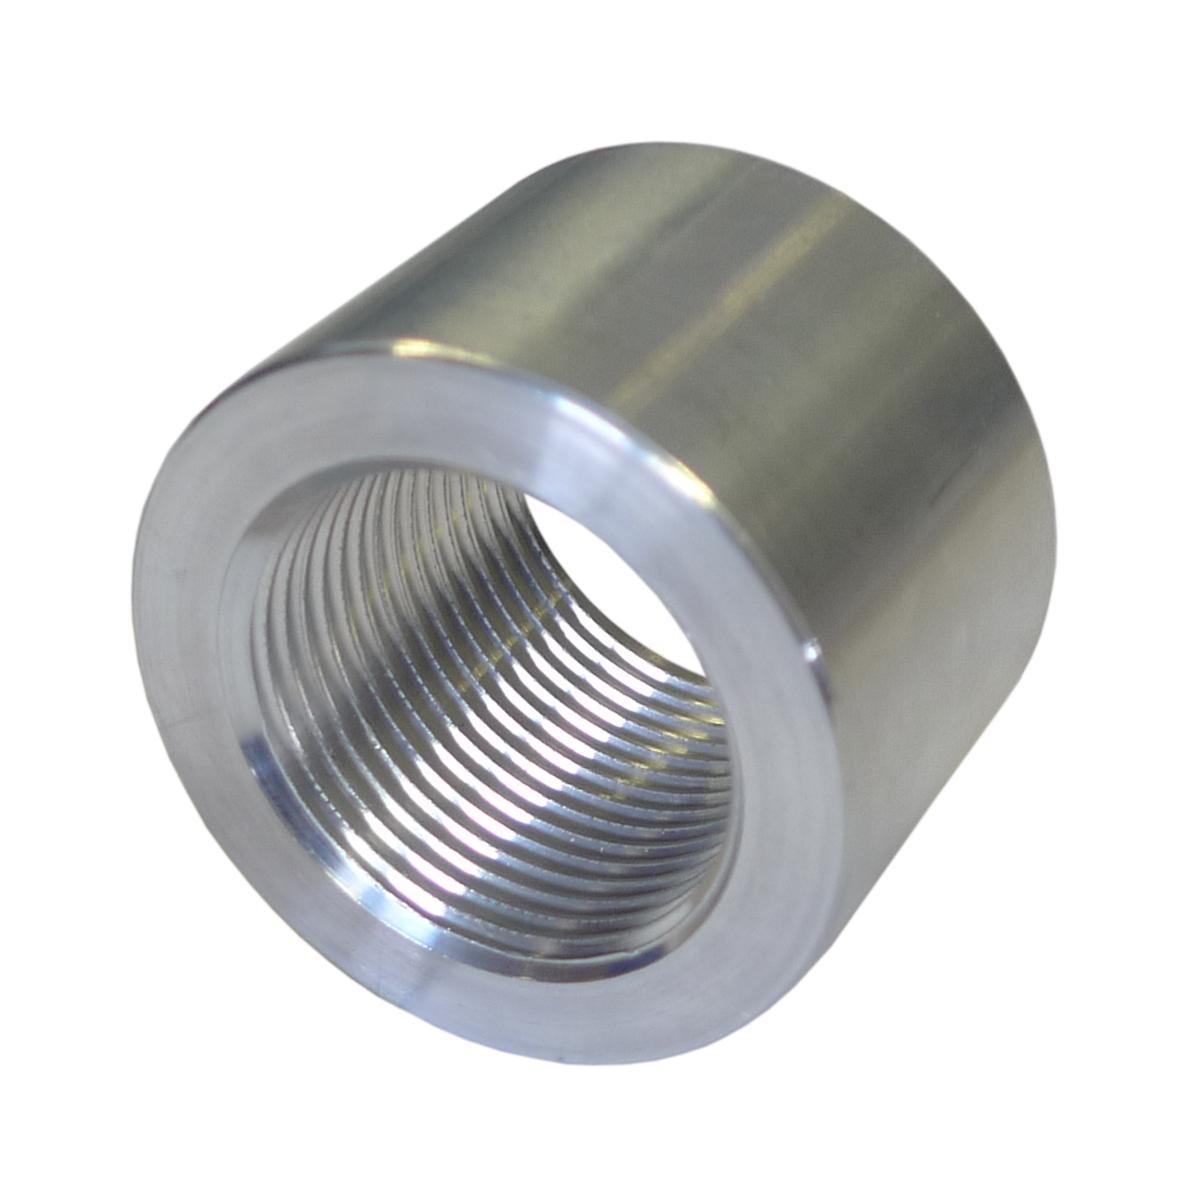 Jic inch unf round female boss weld on